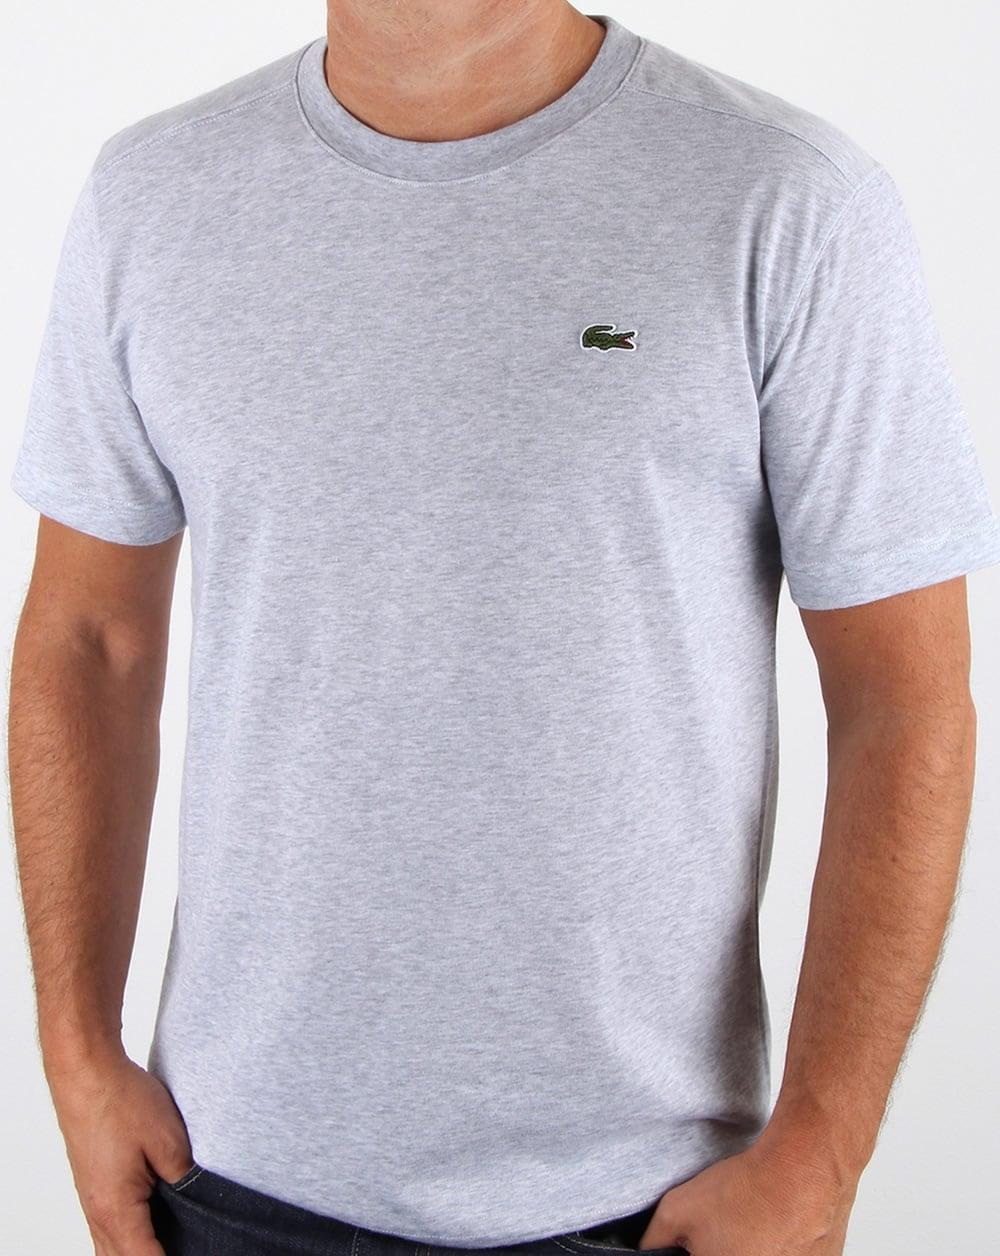 89d2bbd76aa6f Lacoste Lacoste SPT T-shirt Light Grey Marl